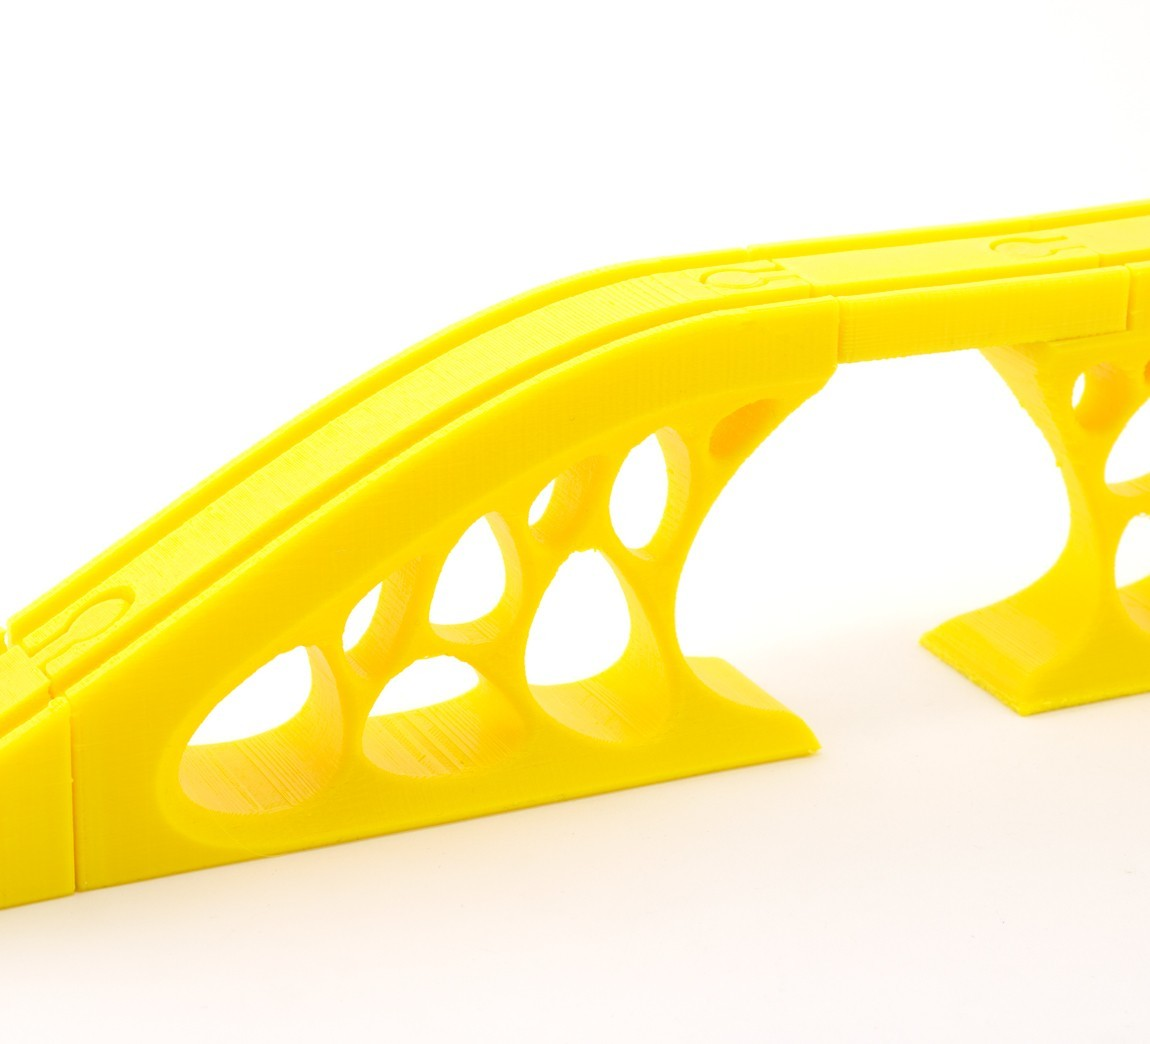 91cb4f62ceb4627f4039d91b0e40adb8_1449686568173_12.2.15-product-shoot-037.jpg Download free STL file Toy Train Tracks • 3D printer design, FerryTeacher